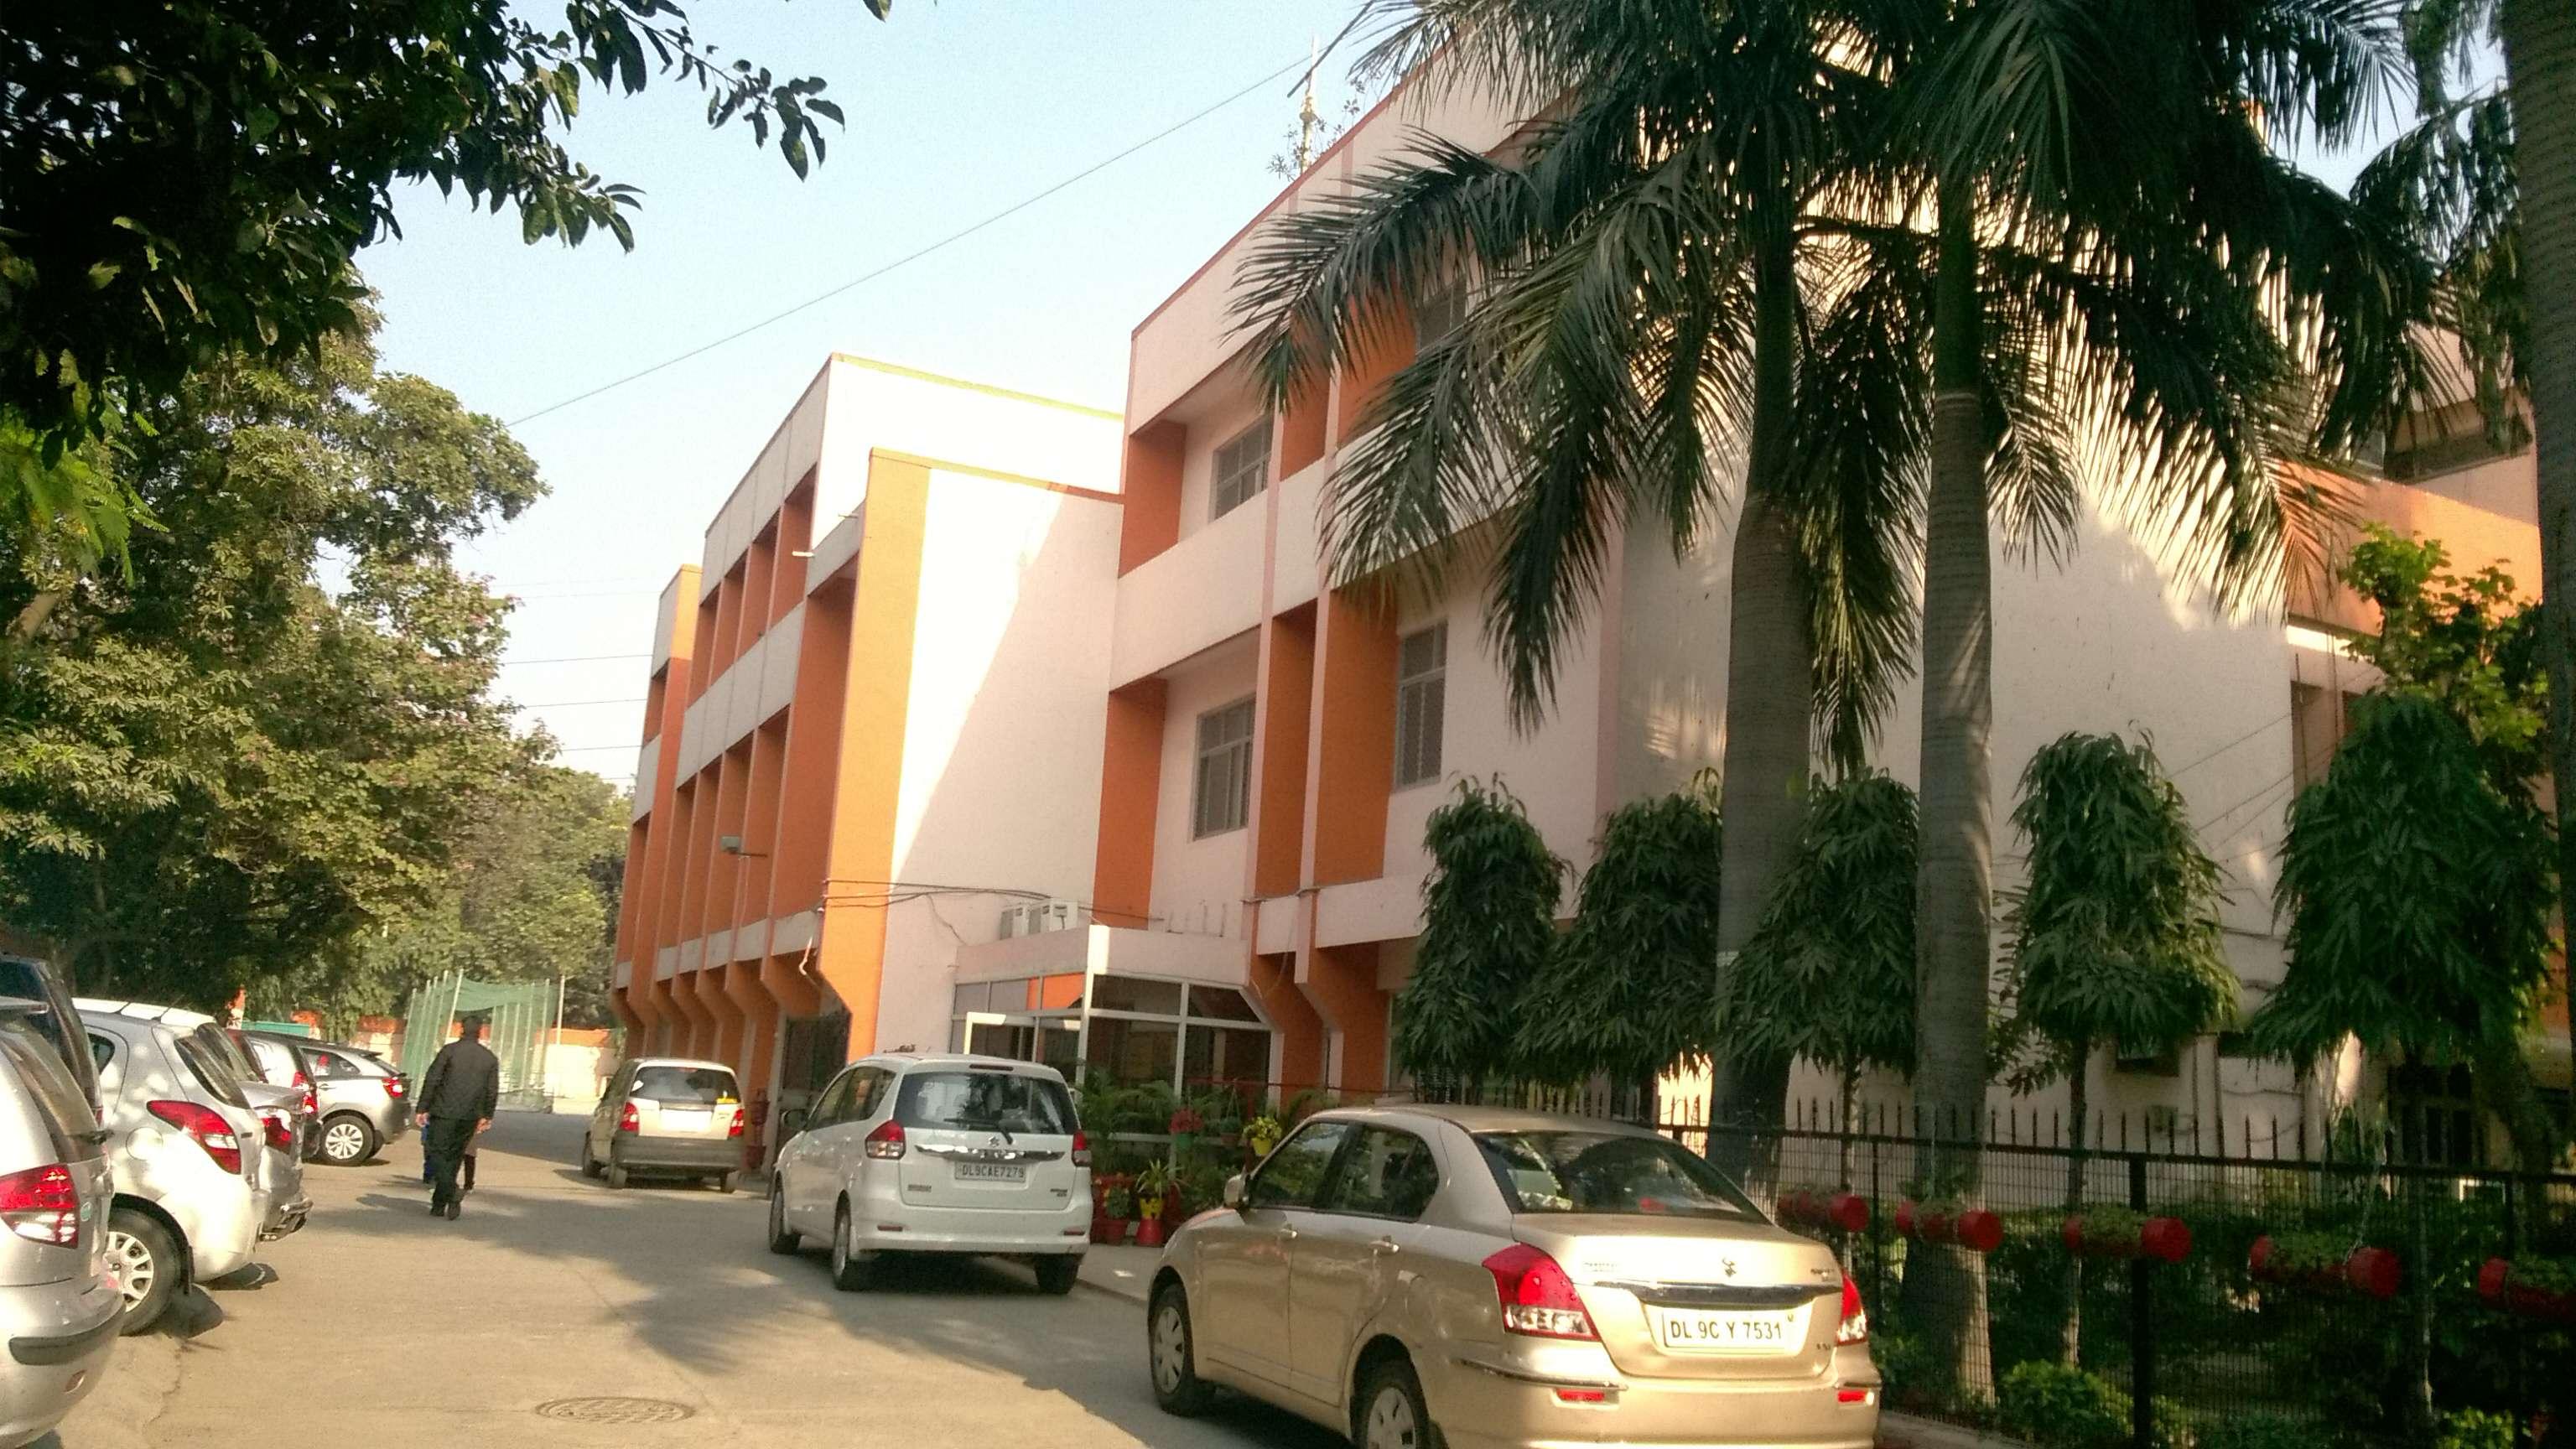 ST MARGARET SR SEC SCHOOL D BLOCK PRASHANT VIHAR ROHINI DELHI 2730146